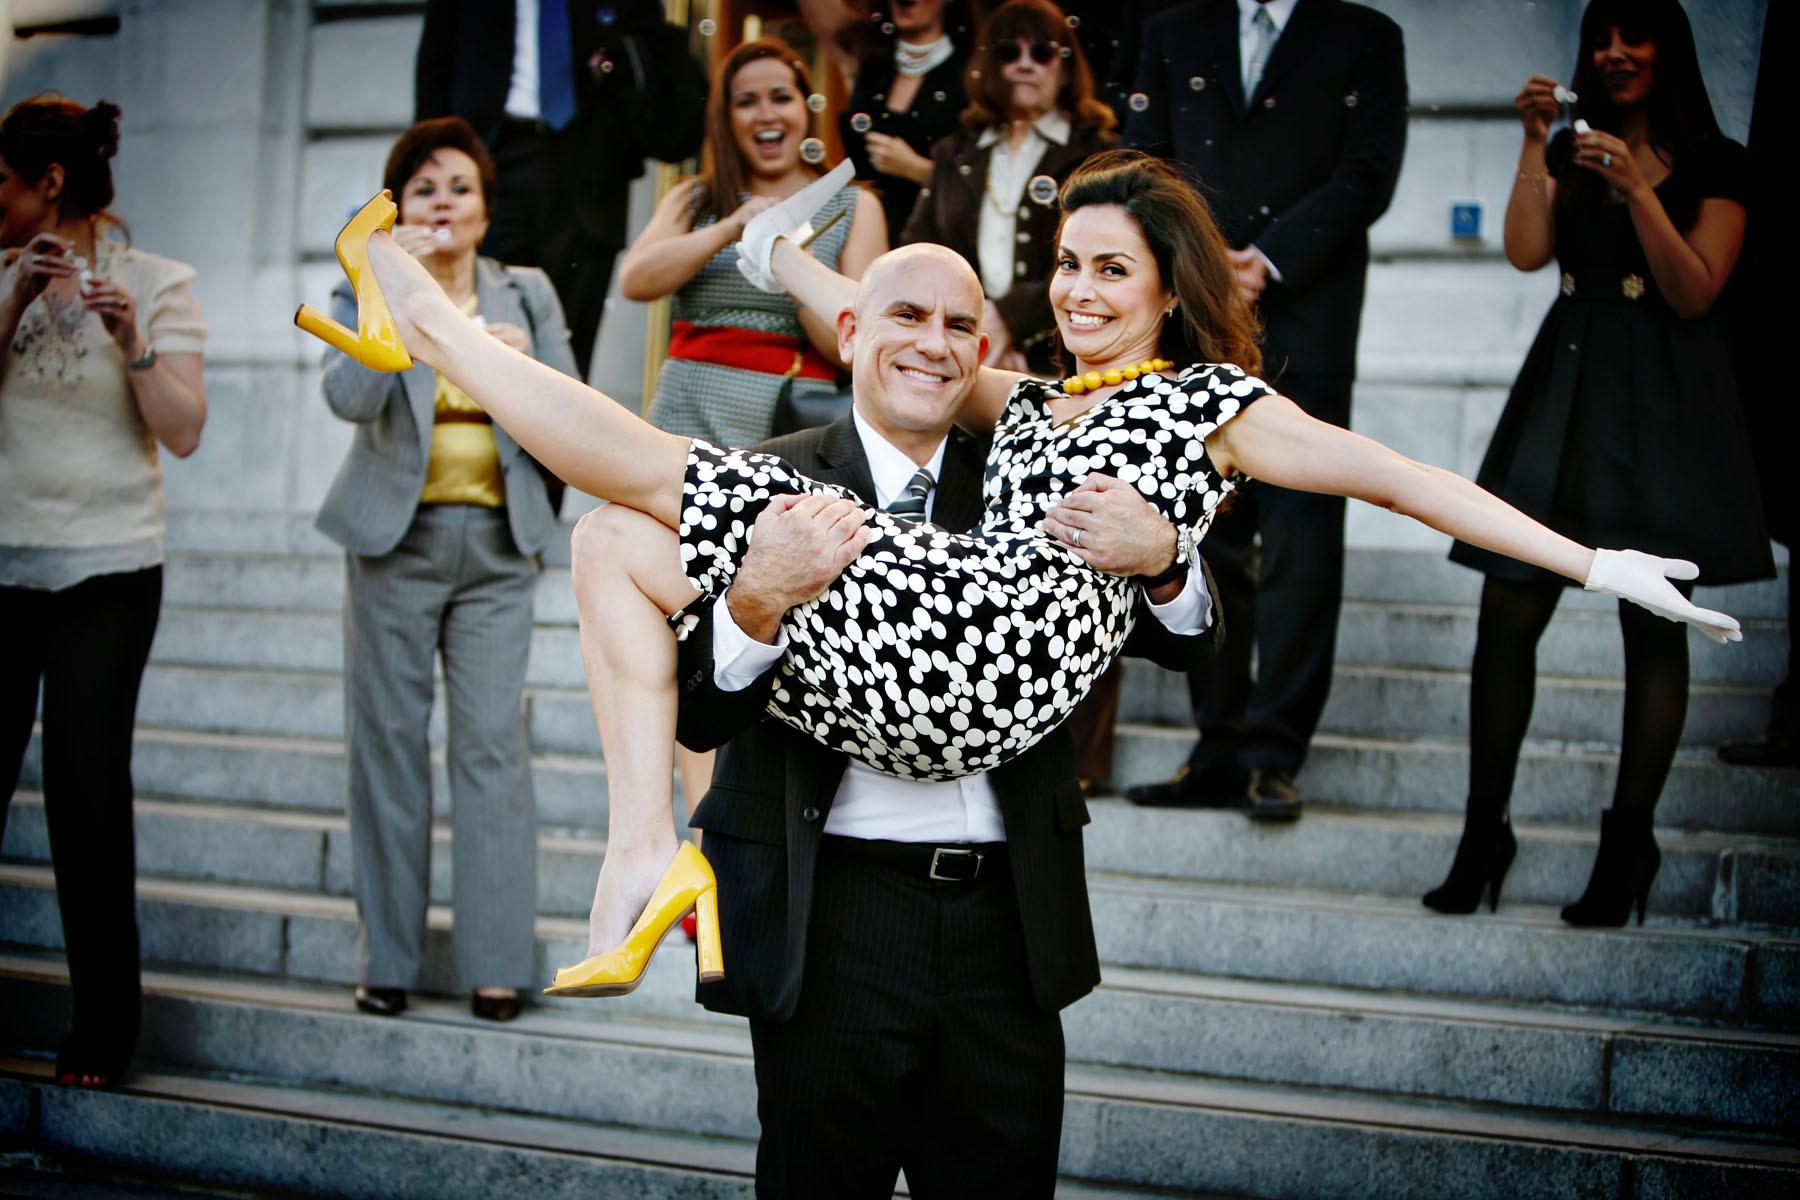 Ceremony, Flowers & Decor, Shoes, Fashion, white, yellow, black, Bride, City, Groom, Wedding, Family, San, Francisco, Hall, Civil